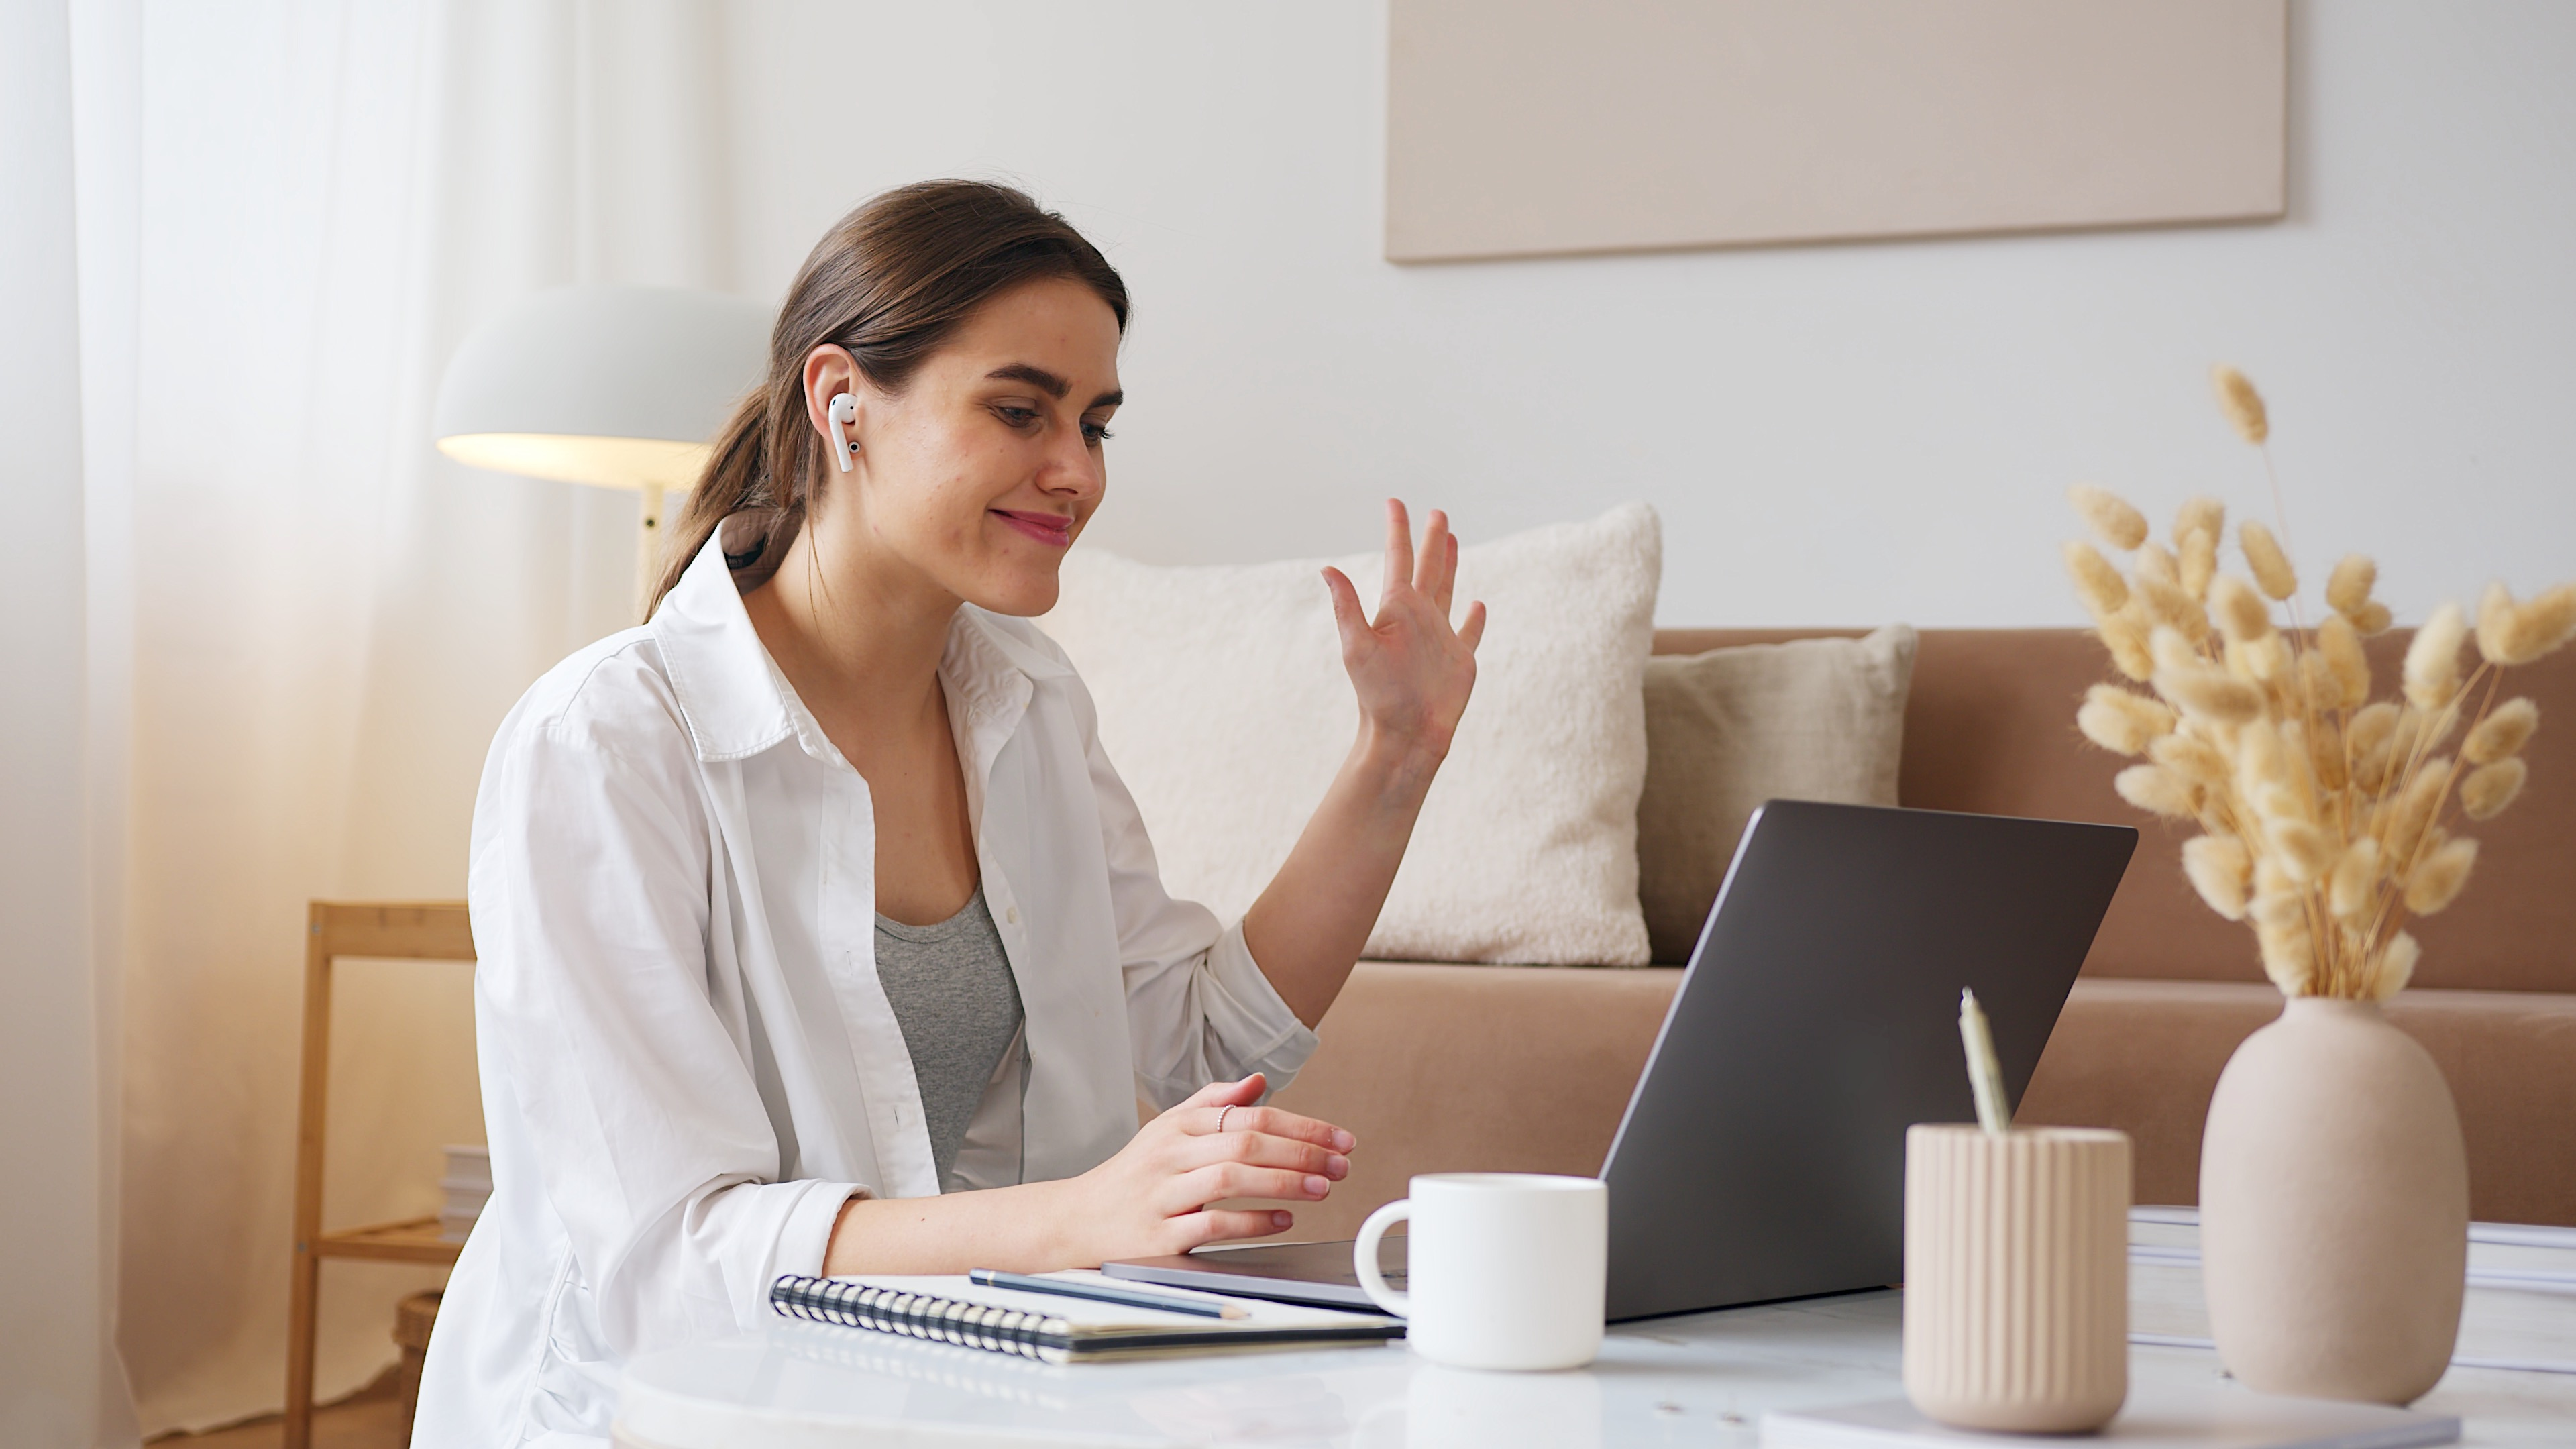 cheerful woman having video call via laptop